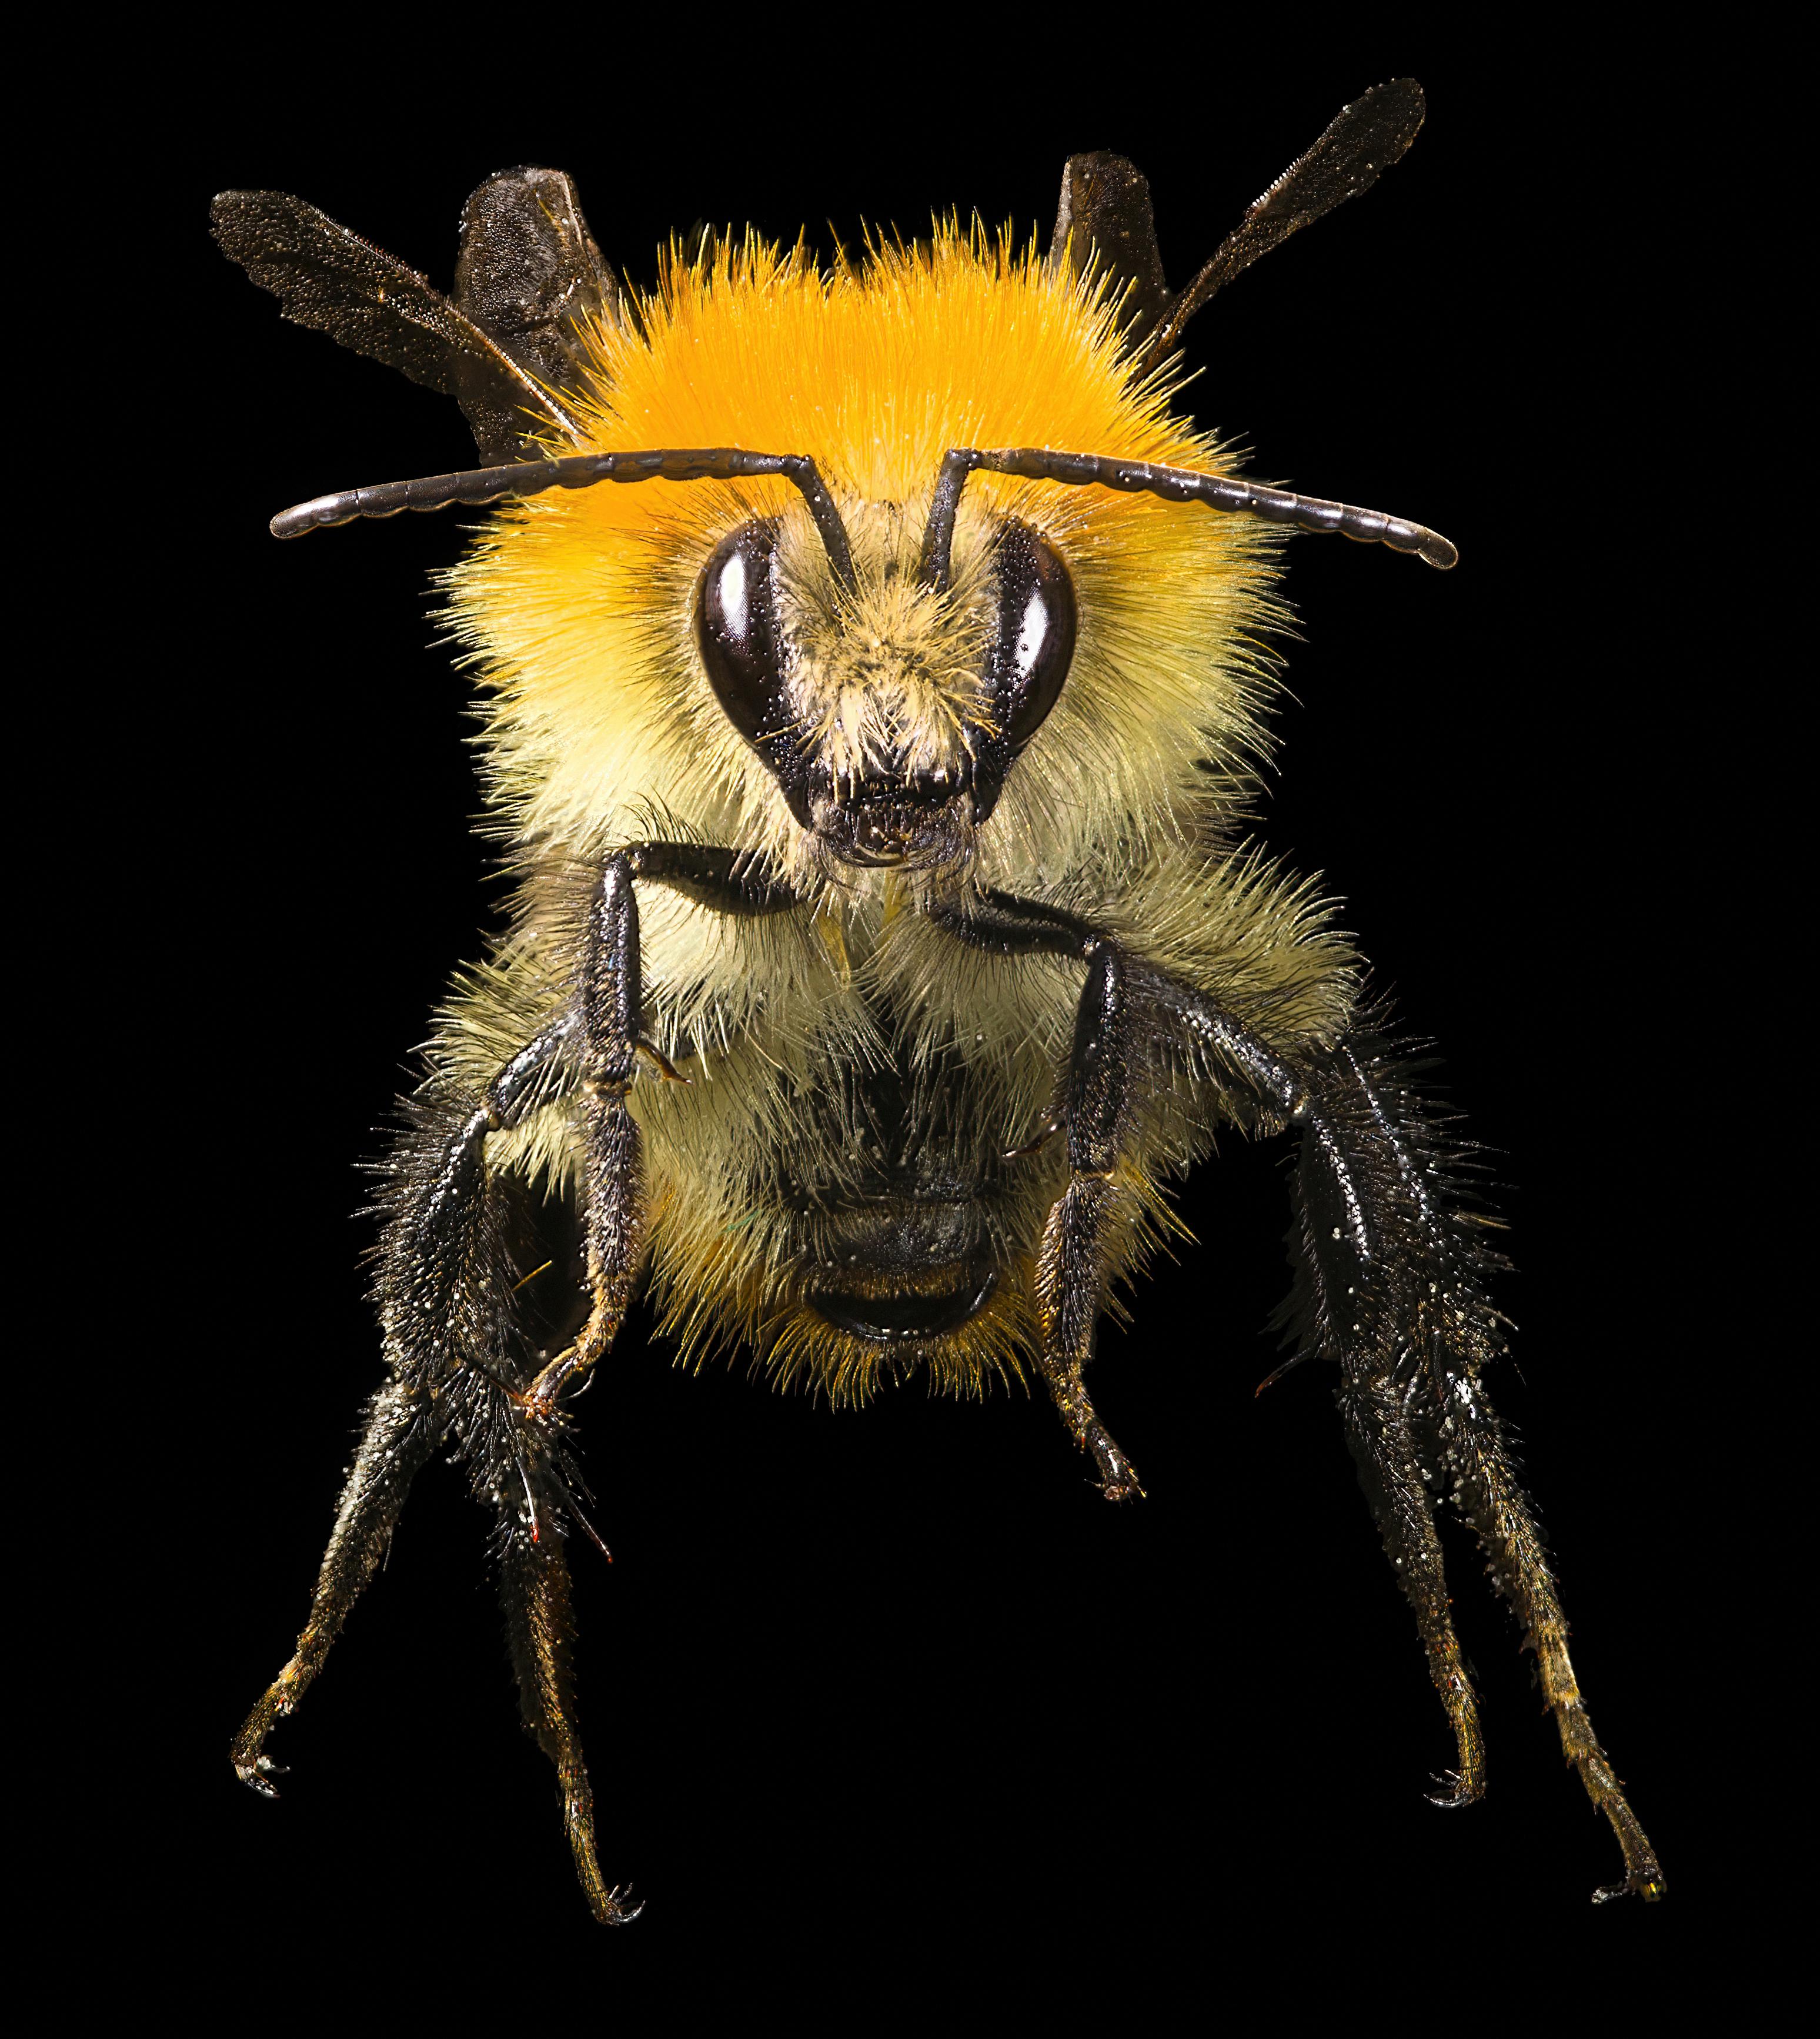 Black Bumble Bee >> File:Bourdon des champs Face.jpg - Wikimedia Commons